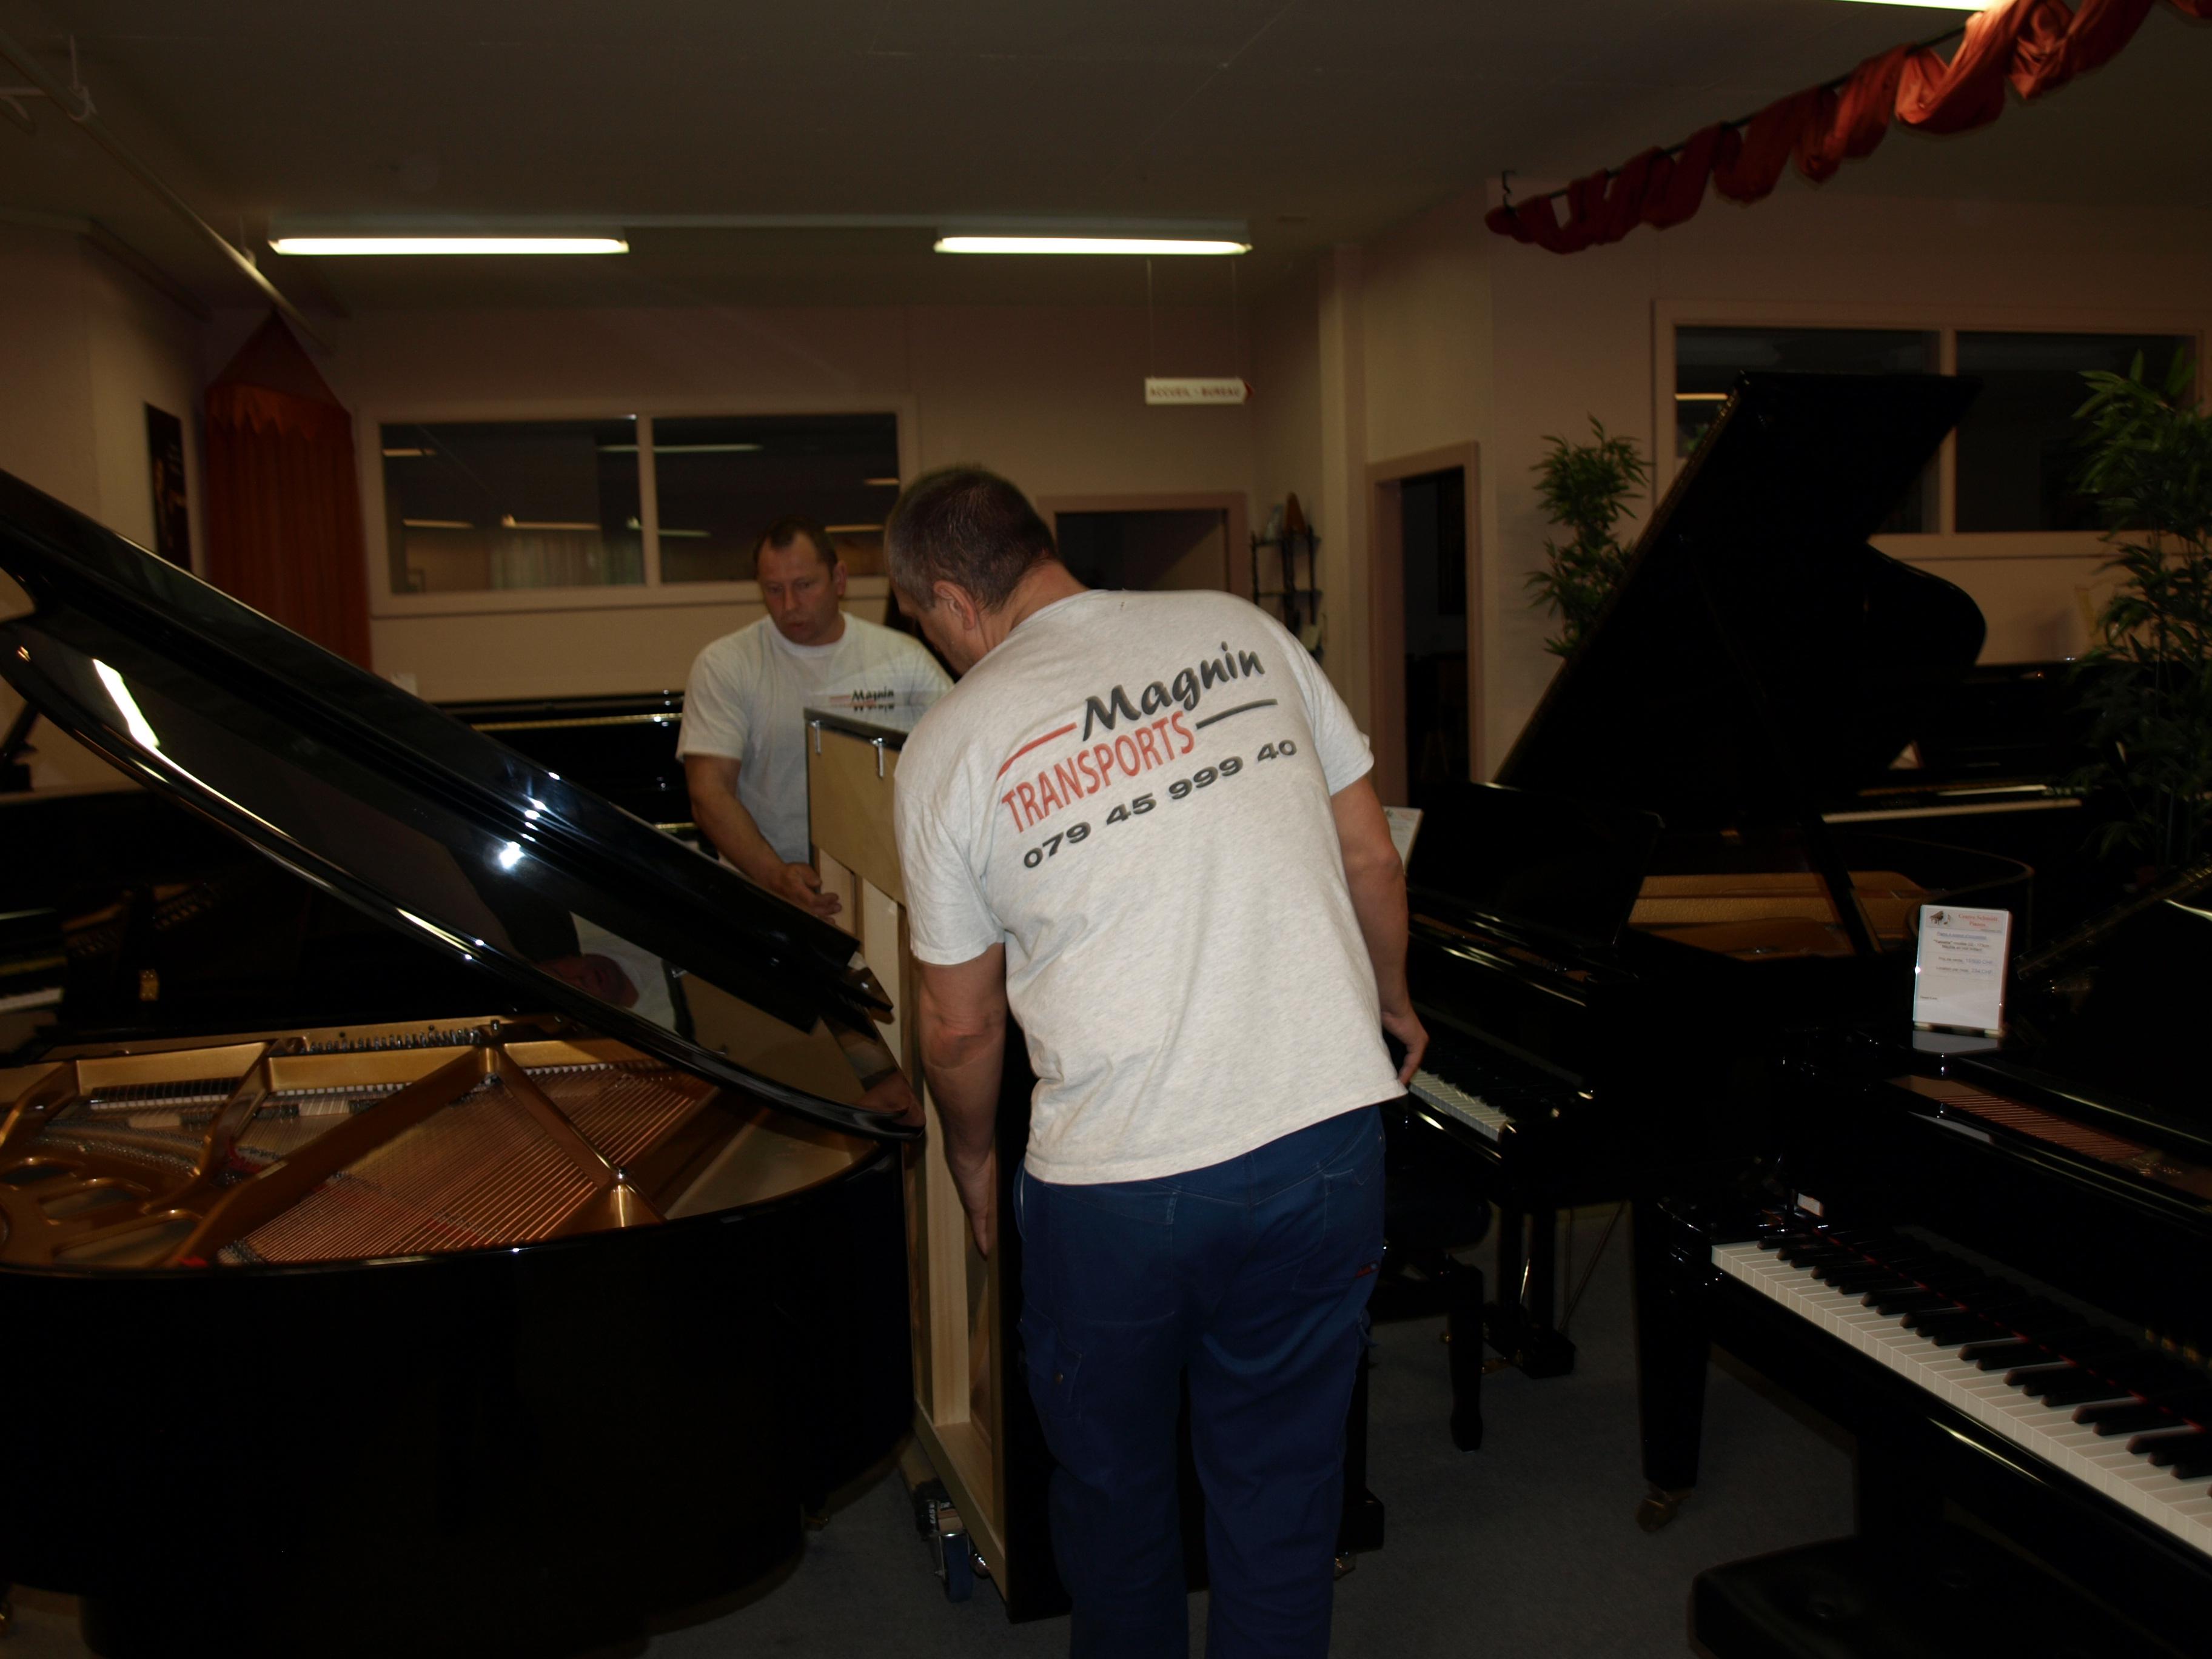 Centre_Schmidt_Pianos_-_MAGNIN_TRANSPORTS_Sàrl_-_955